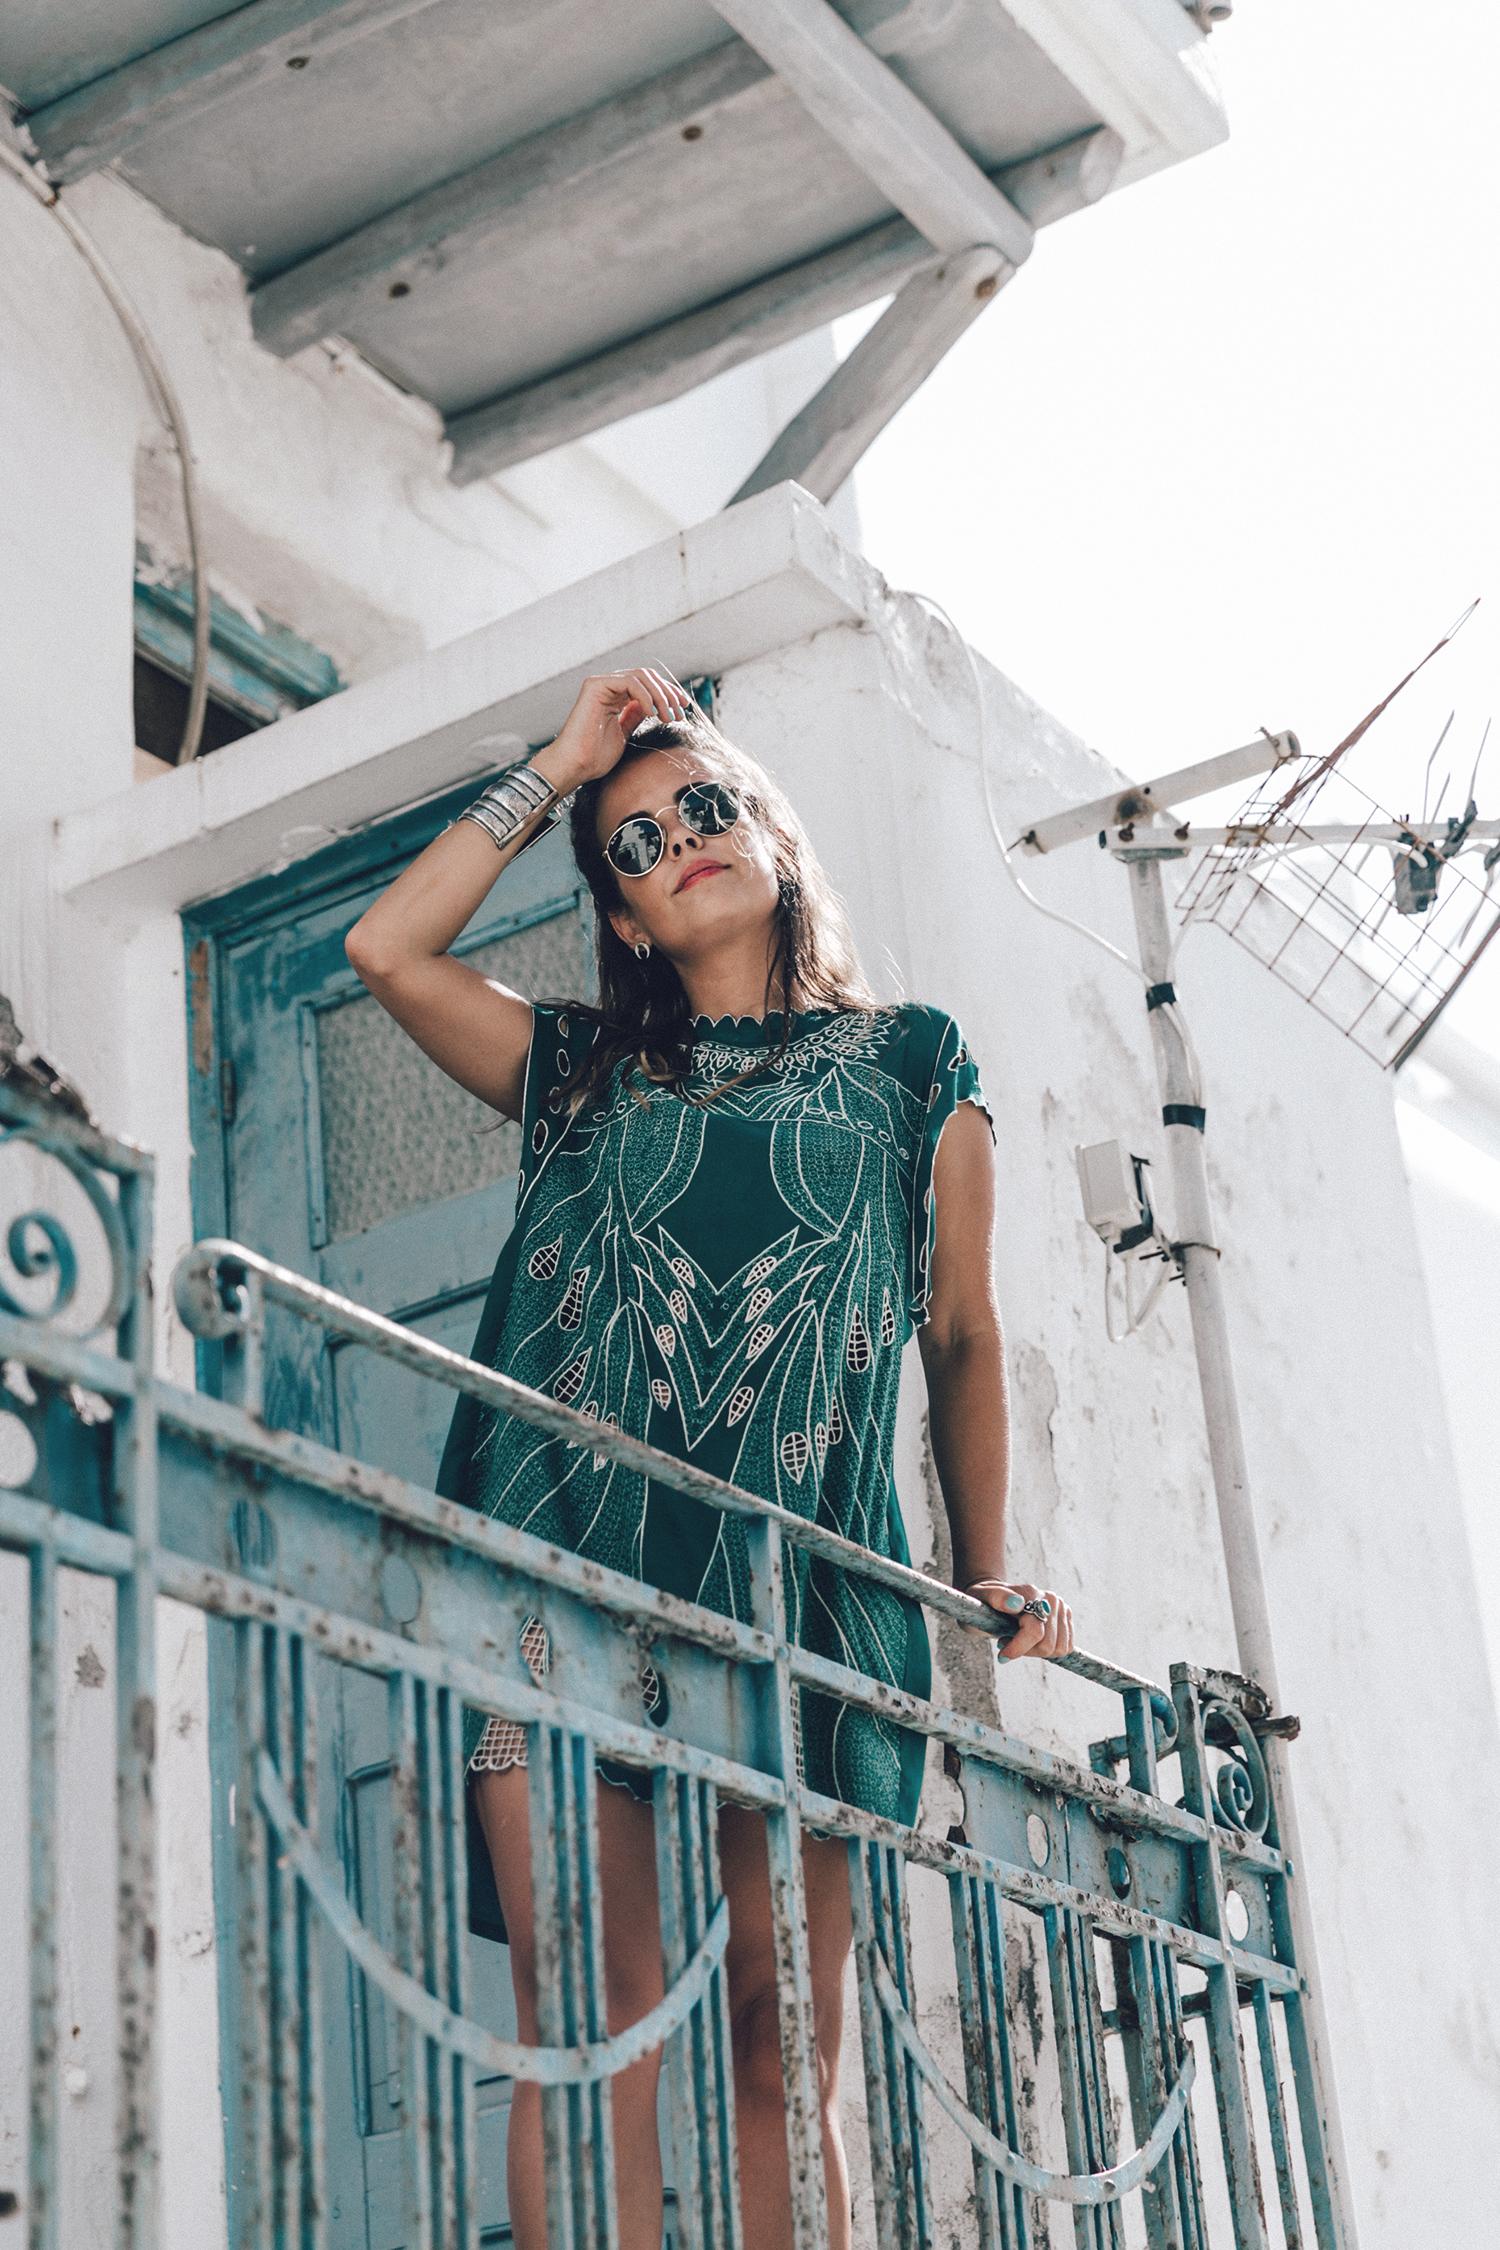 Tularosa_Dress-Soludos_Escapes-Soludos_Espadrilles-Sezane_Bag-Leather_Crossbody_Bag-Boho_Outfit-Look-Ray_Ban-Street_Style-Mykonos-Greece-Collage_Vintage-31